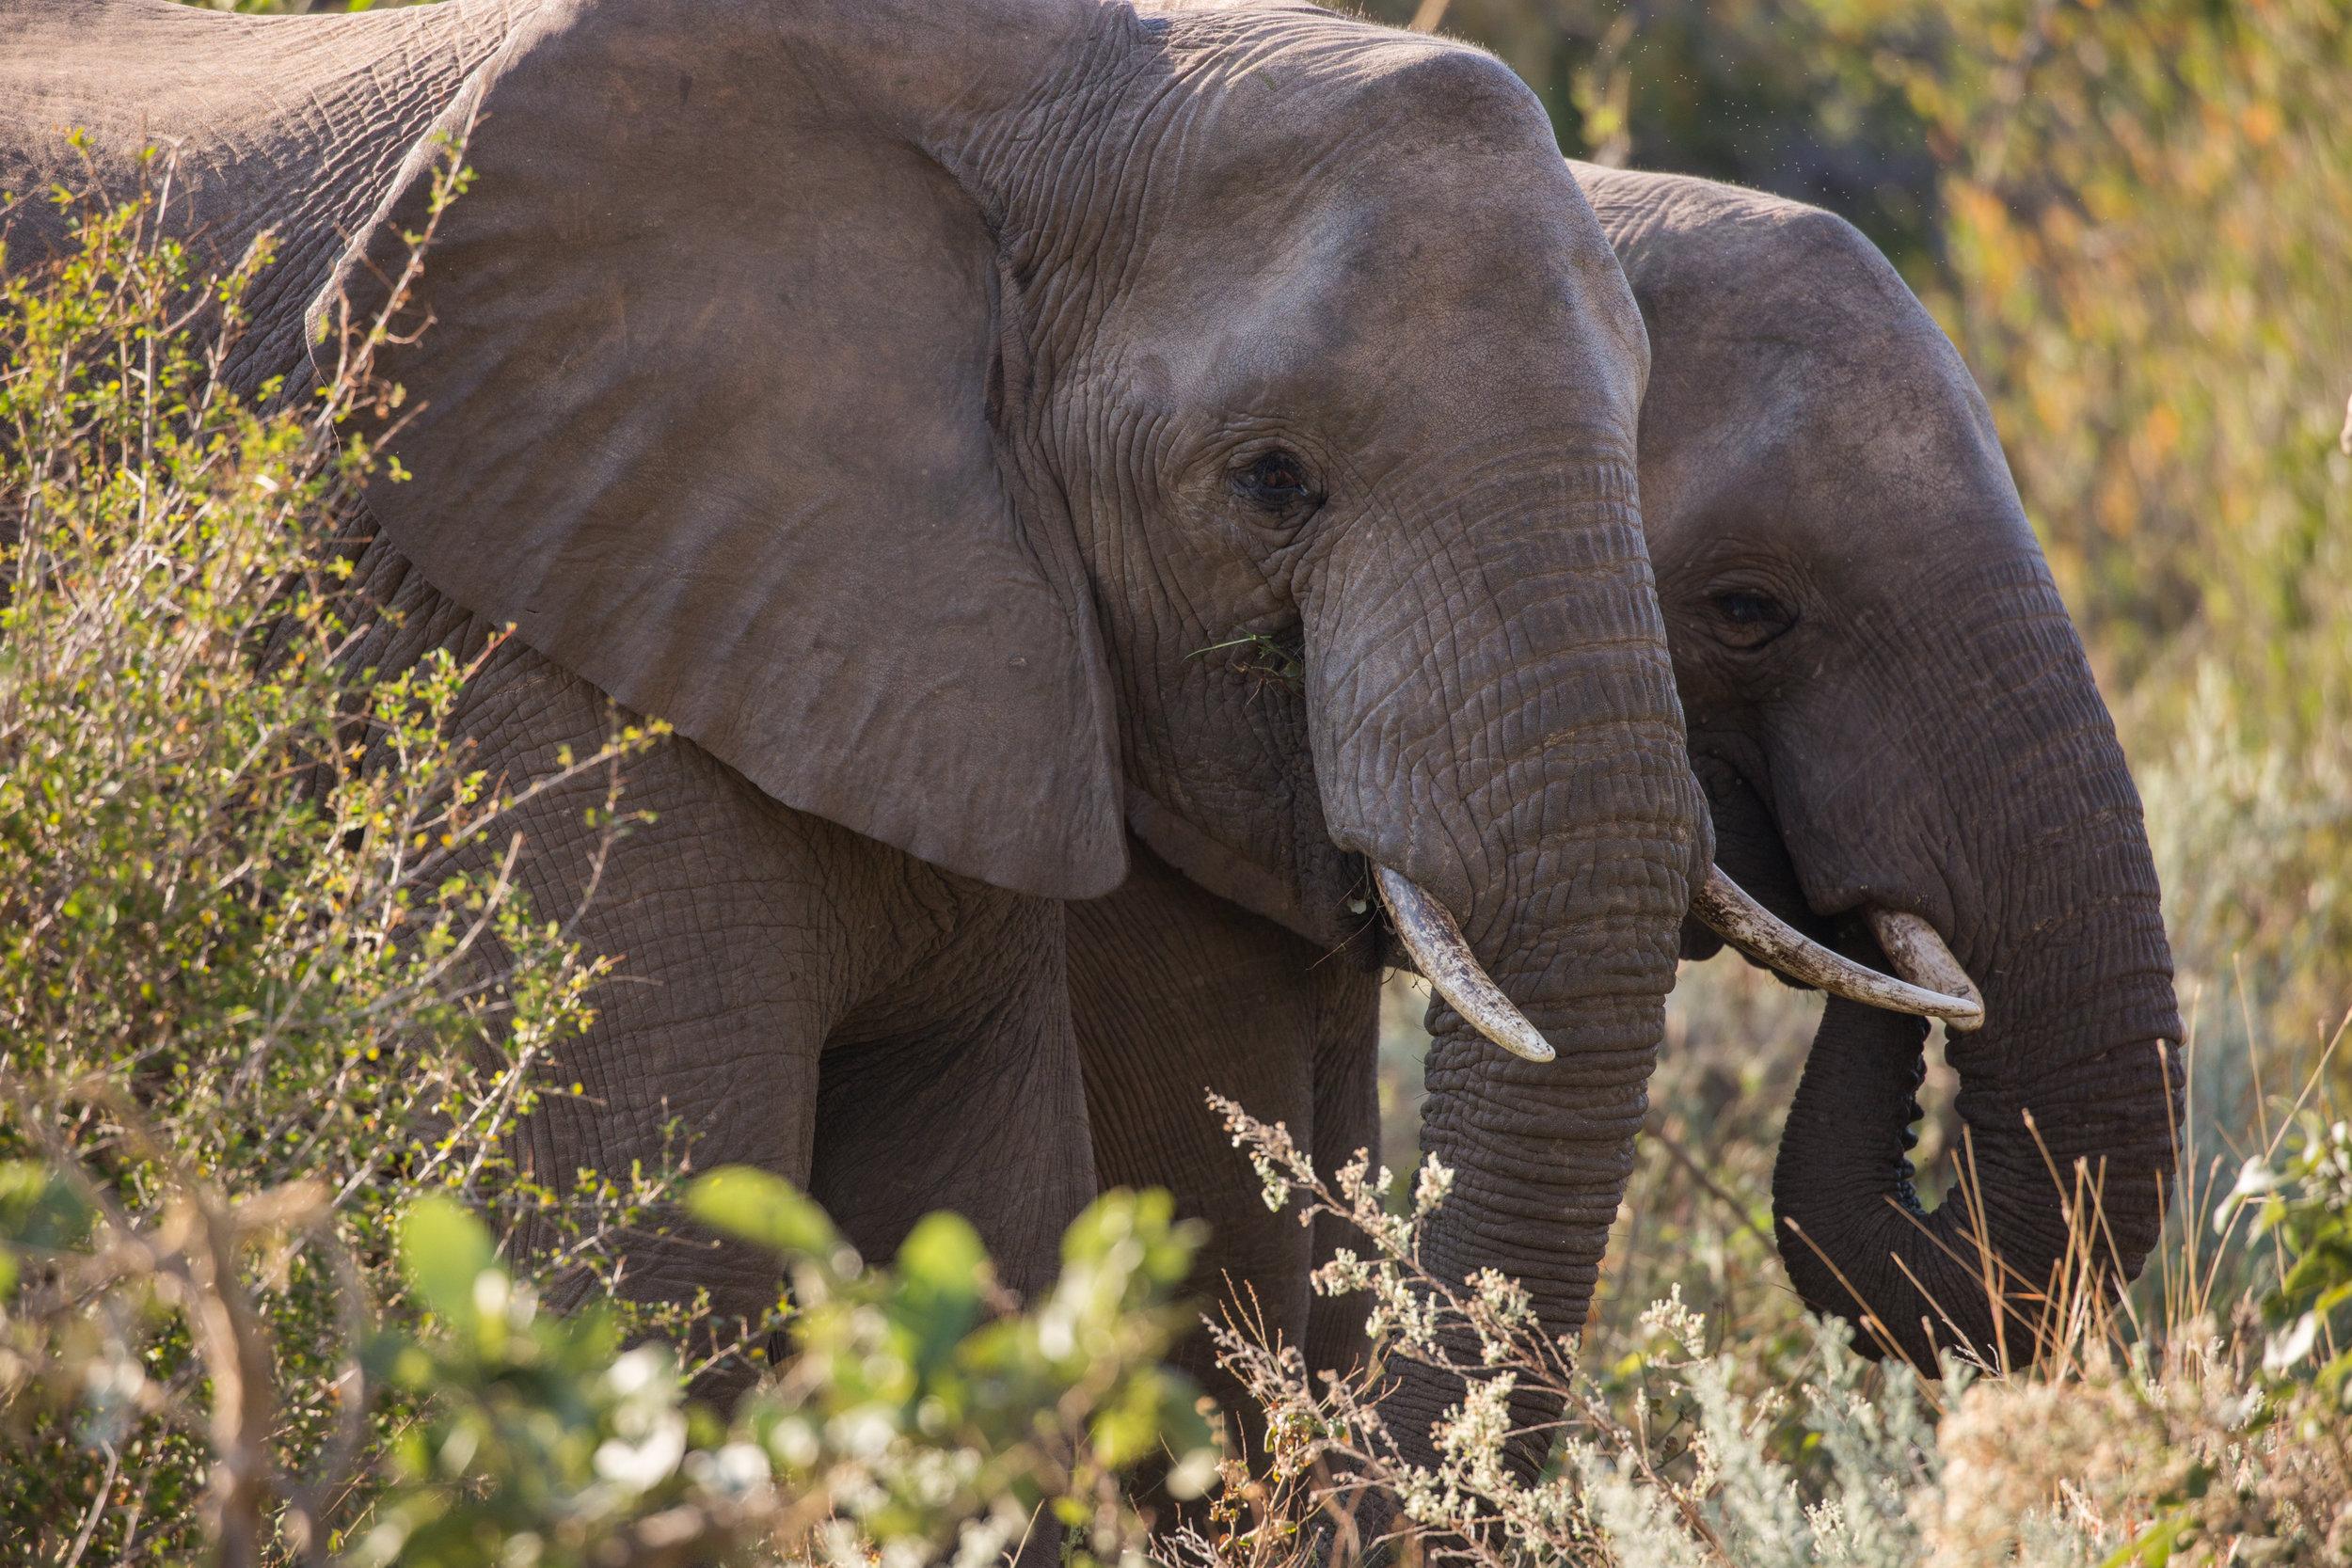 FM_Partnership_ResponsibleSourcing_Website_ElephantImage.jpg